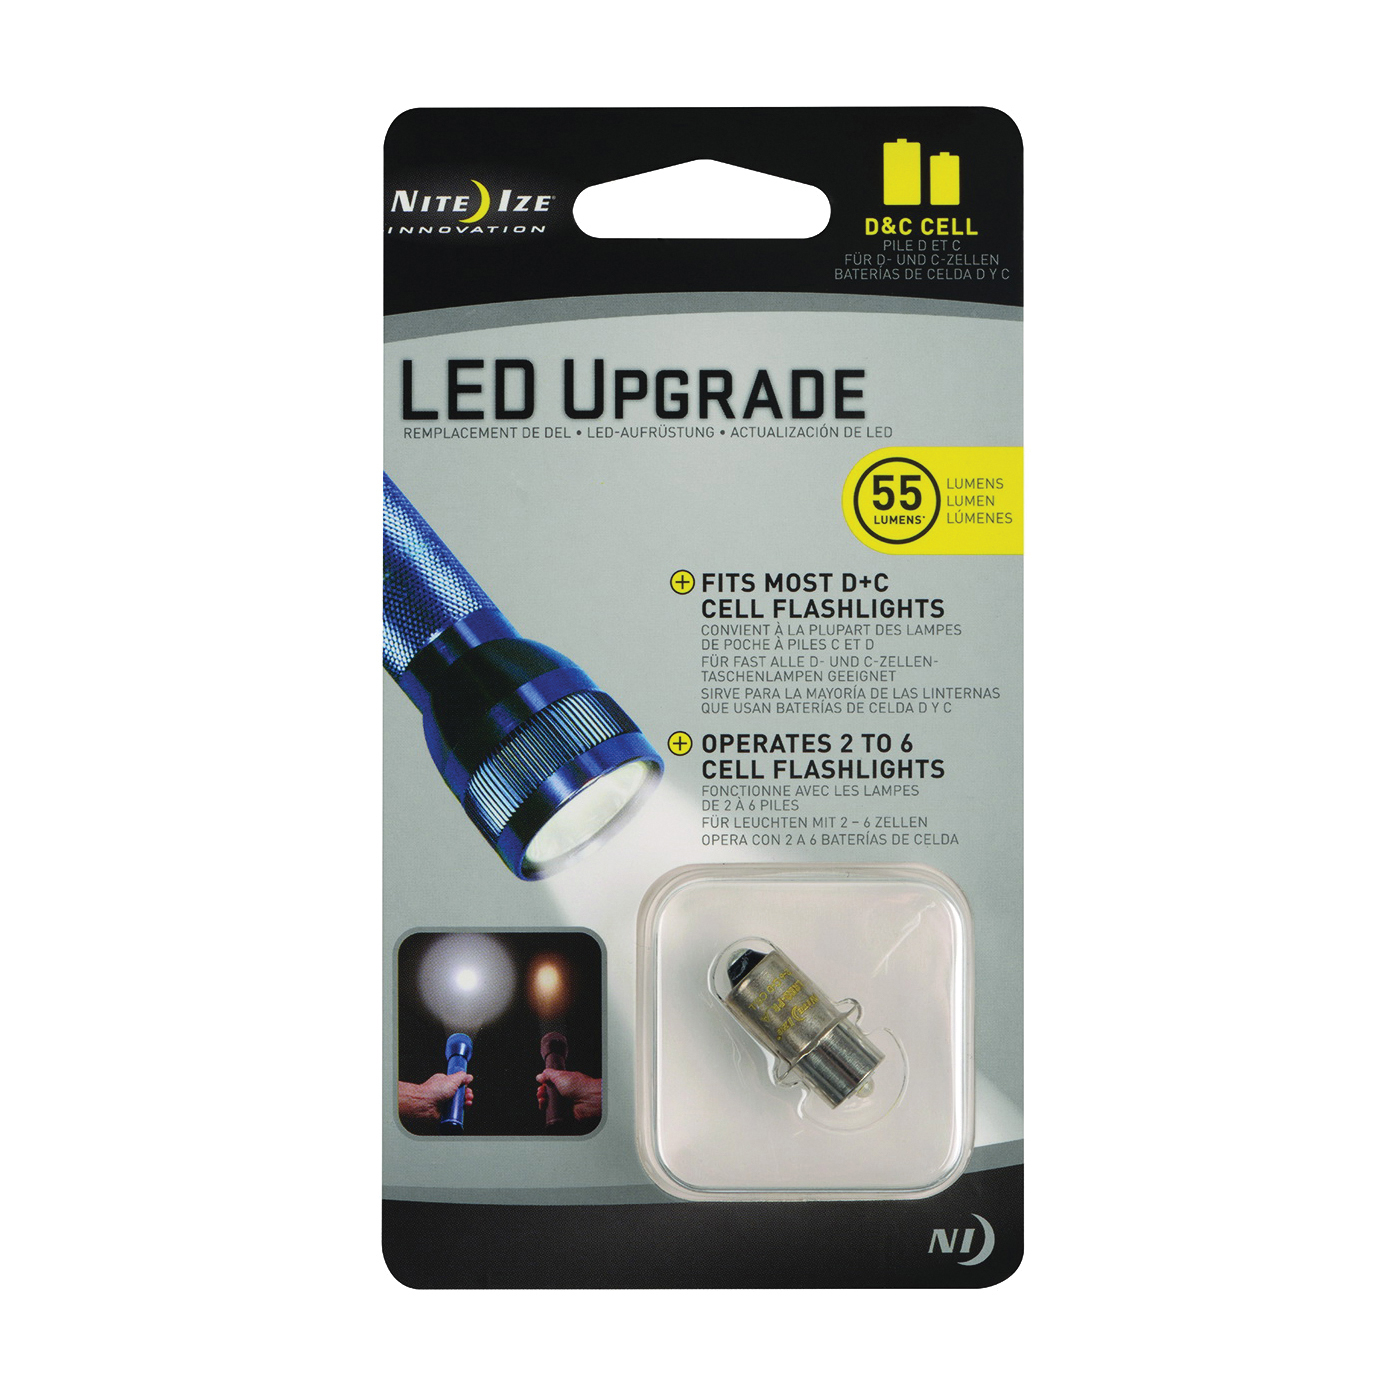 Picture of Nite Ize LRB2-07-PR LED Upgrade Kit, 55 Lumens